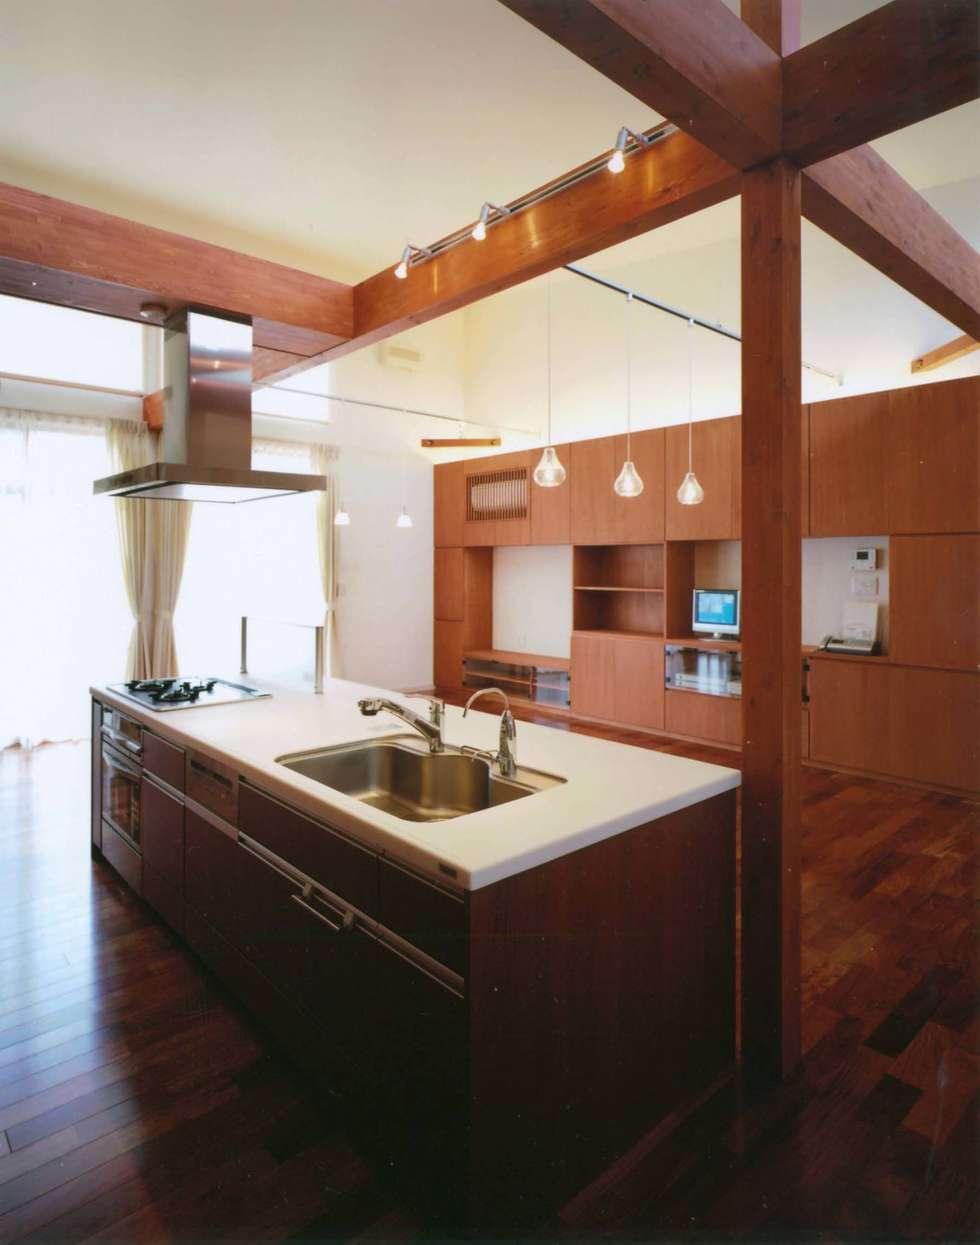 House of the big roof: Sakurayama-Architect-Designが手掛けたキッチンです。